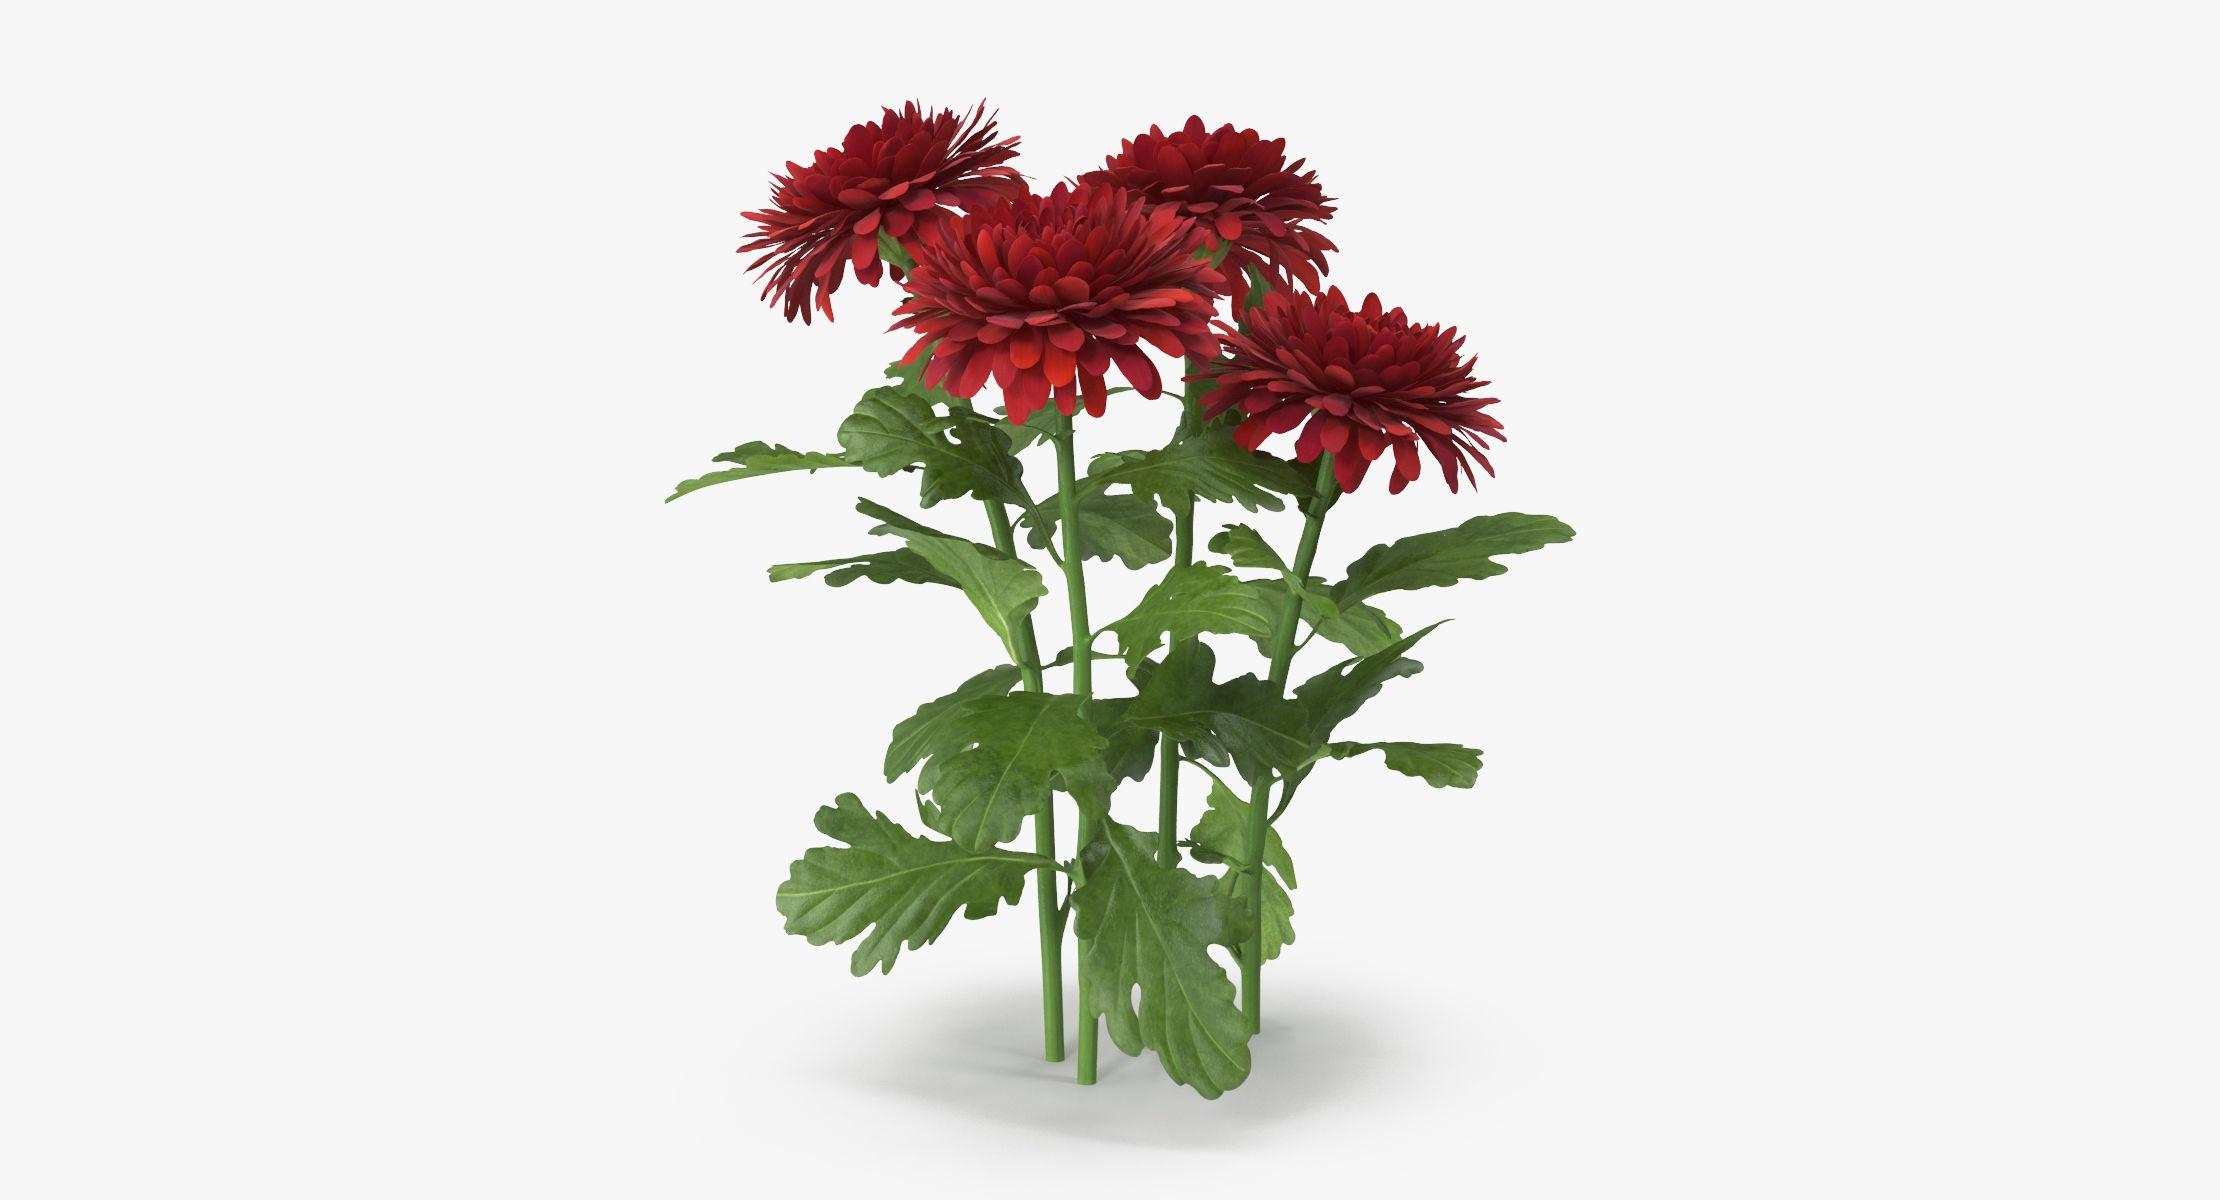 Chrysanthemum Red - Natural Group - reel 1